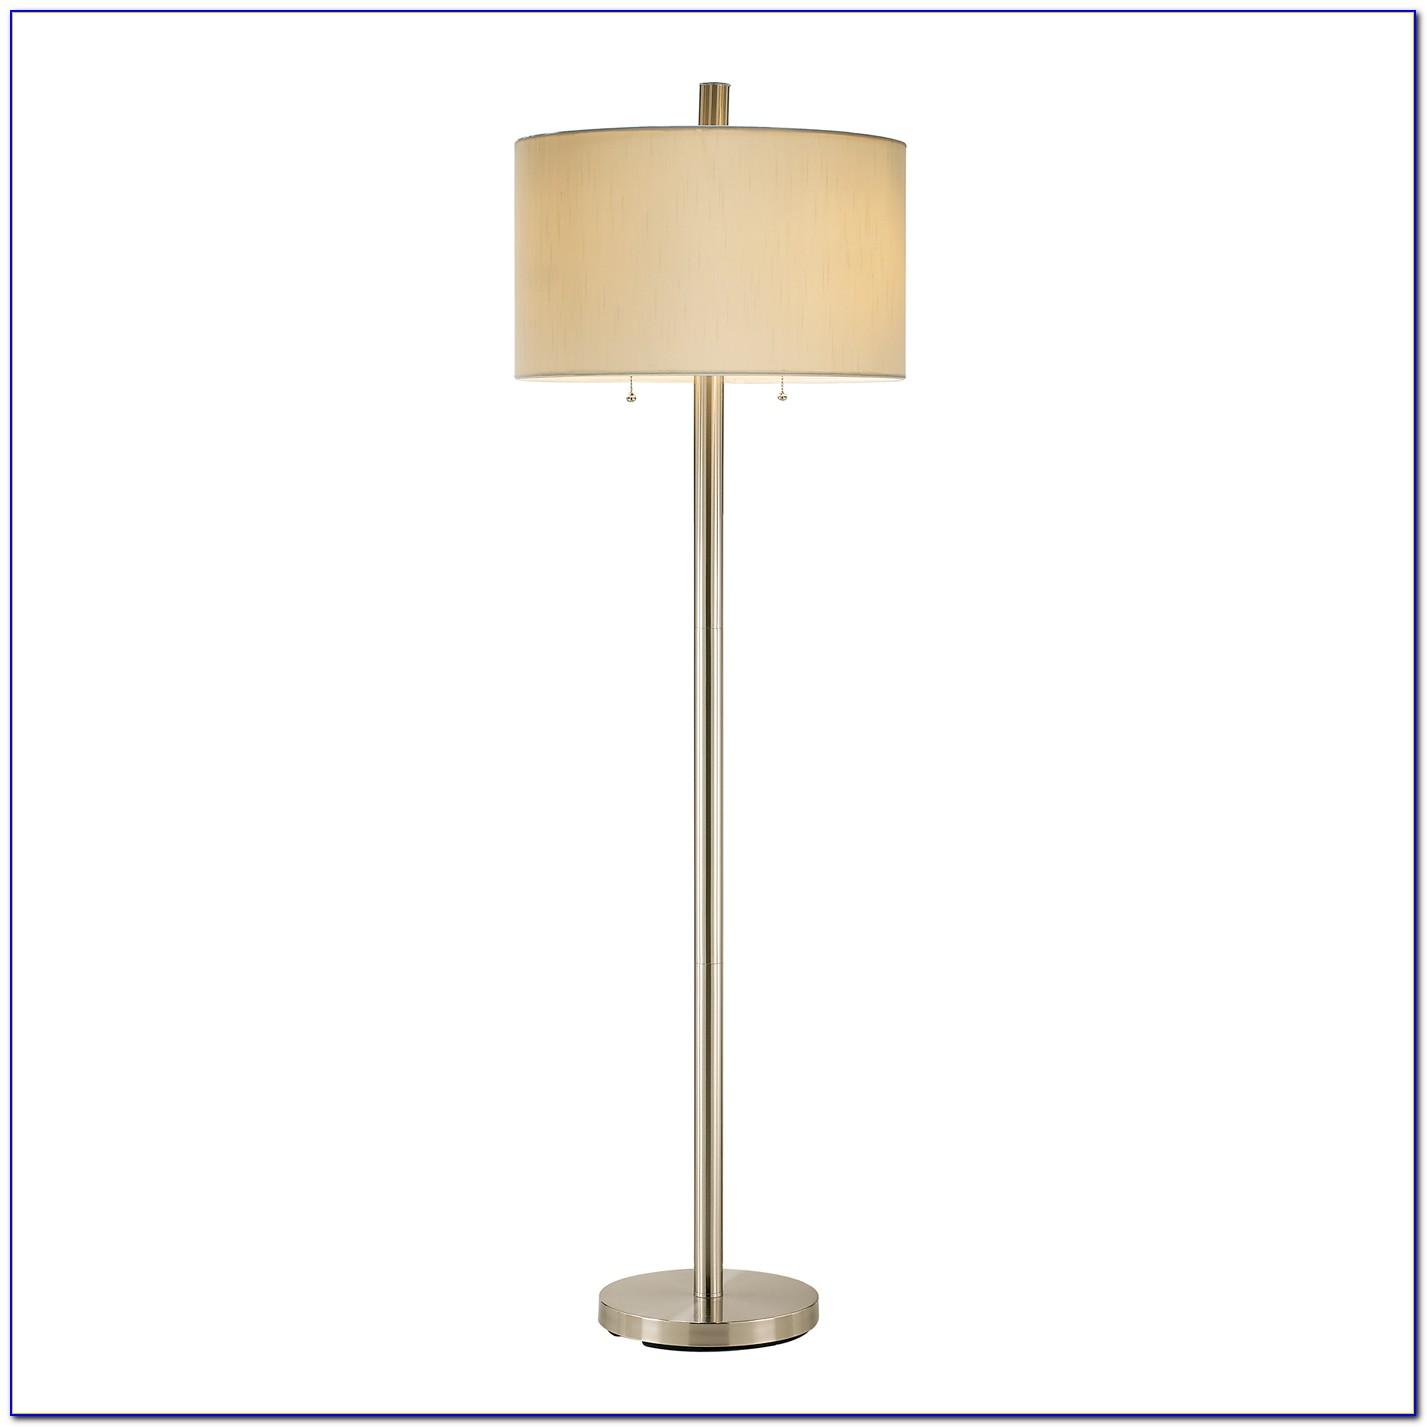 Adesso boulevard floor lamp satin steel flooring home design adesso boulevard floor lamp satin steel aloadofball Choice Image